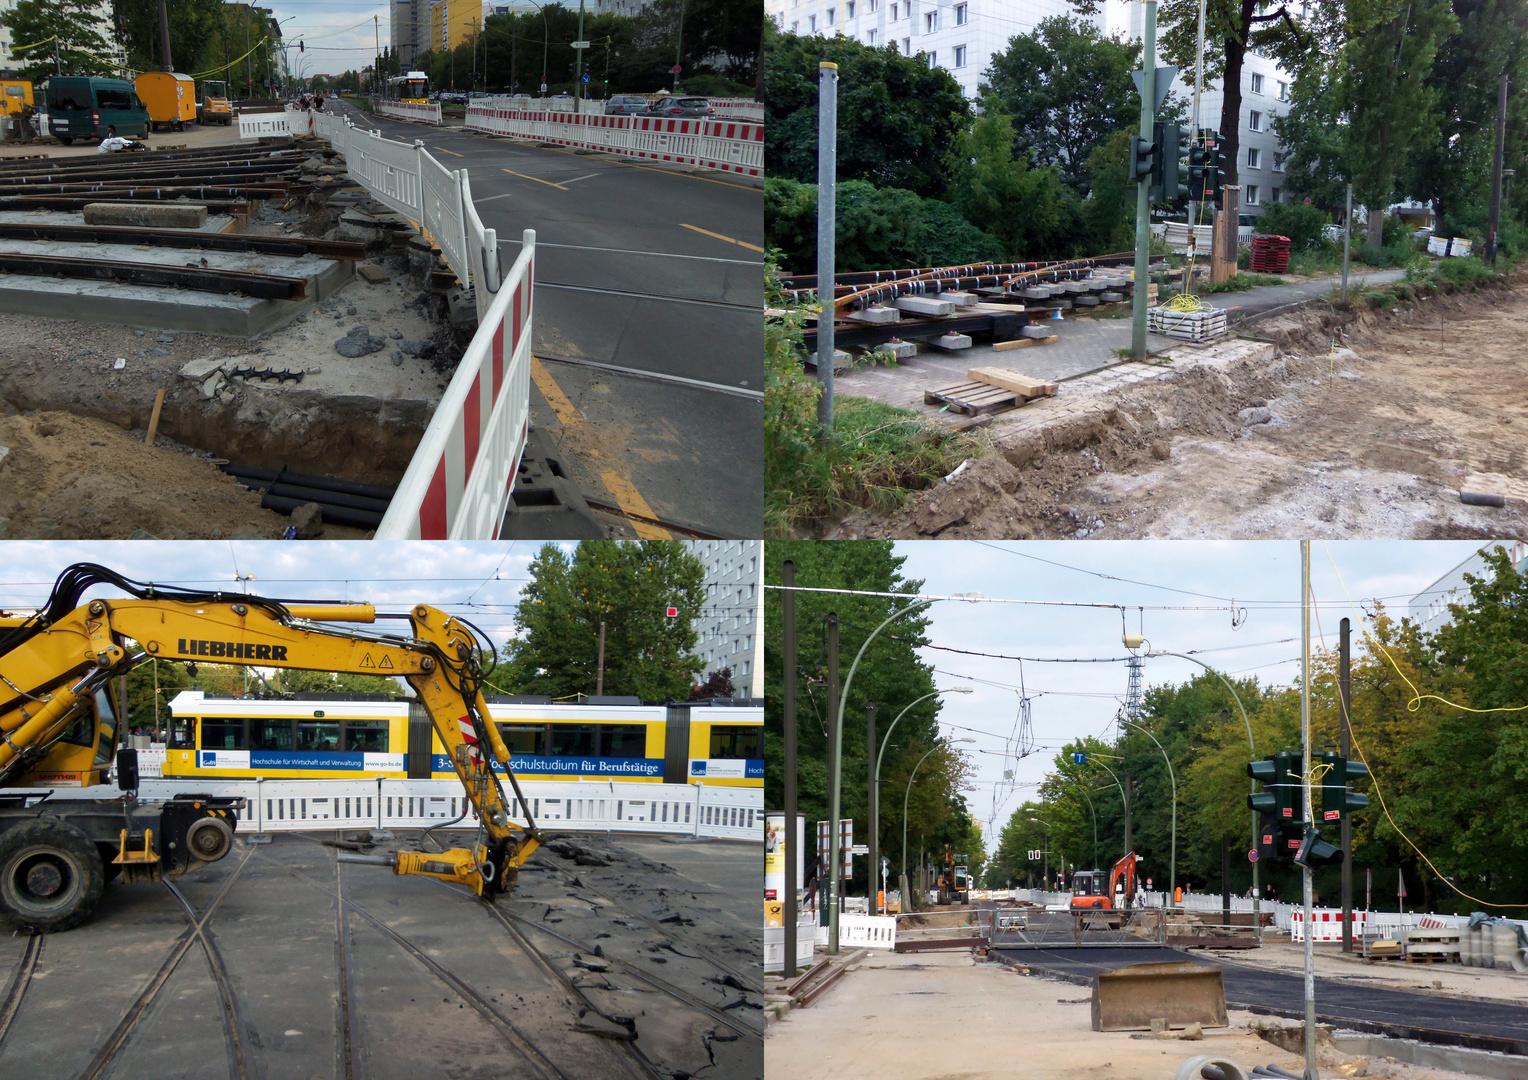 Knoten Roederplatz Bauarbeiten Bild 6